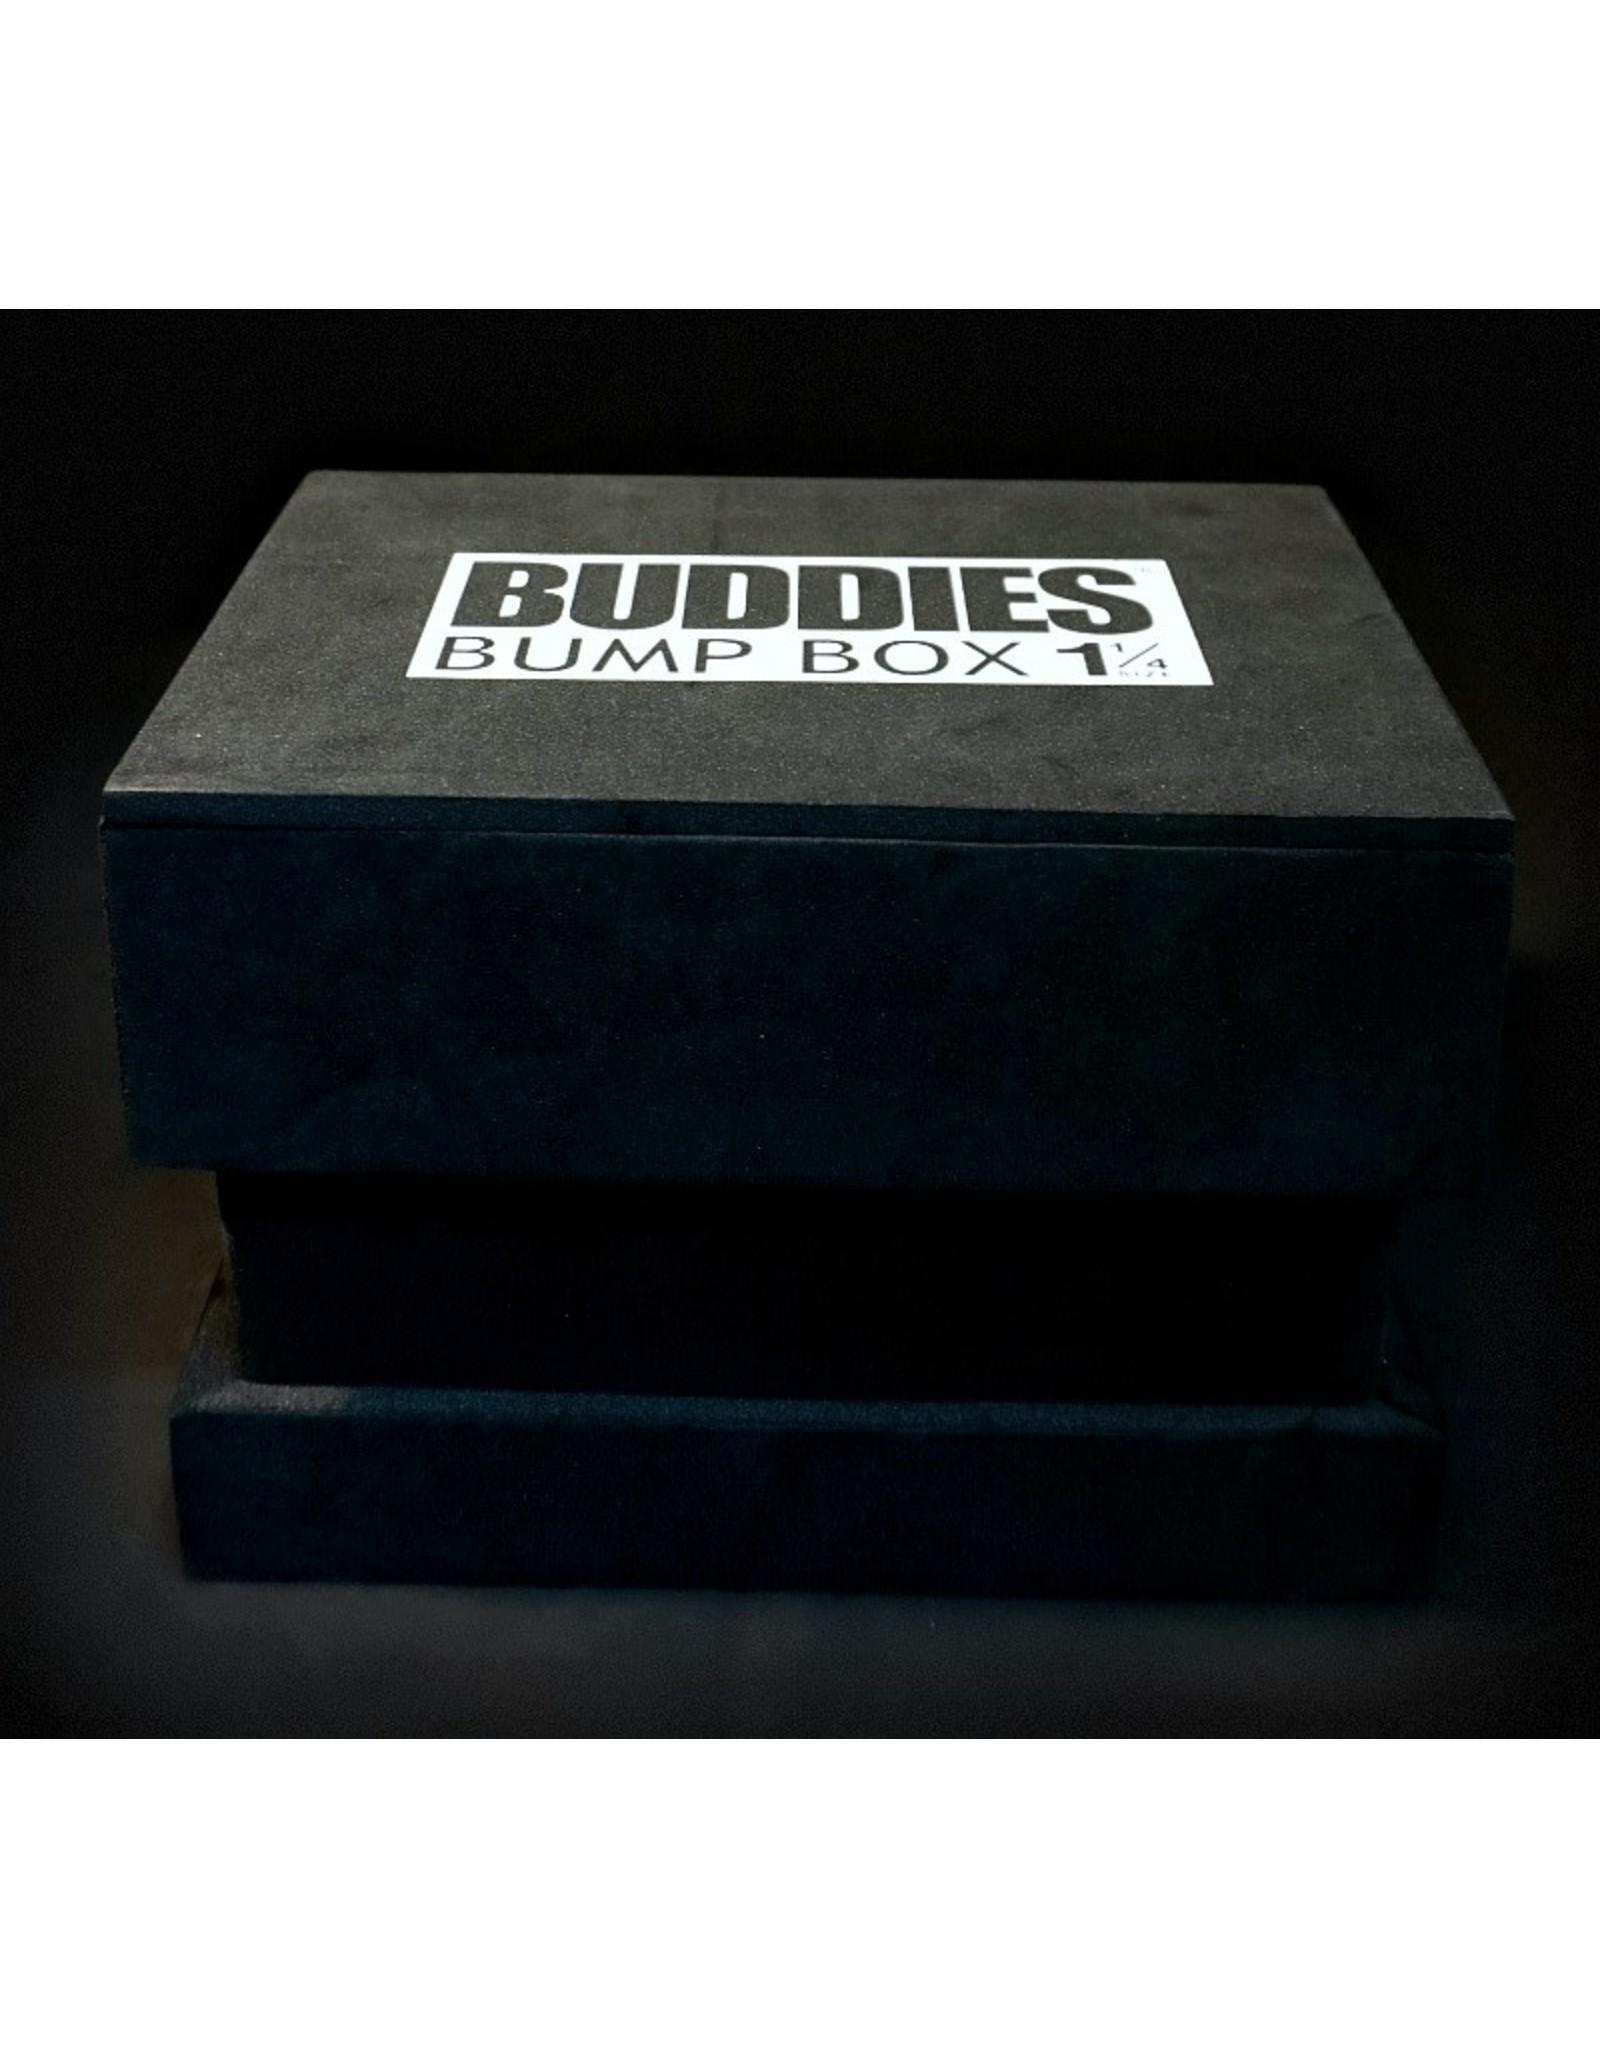 Buddies Bump Box Cone Filler 1.25